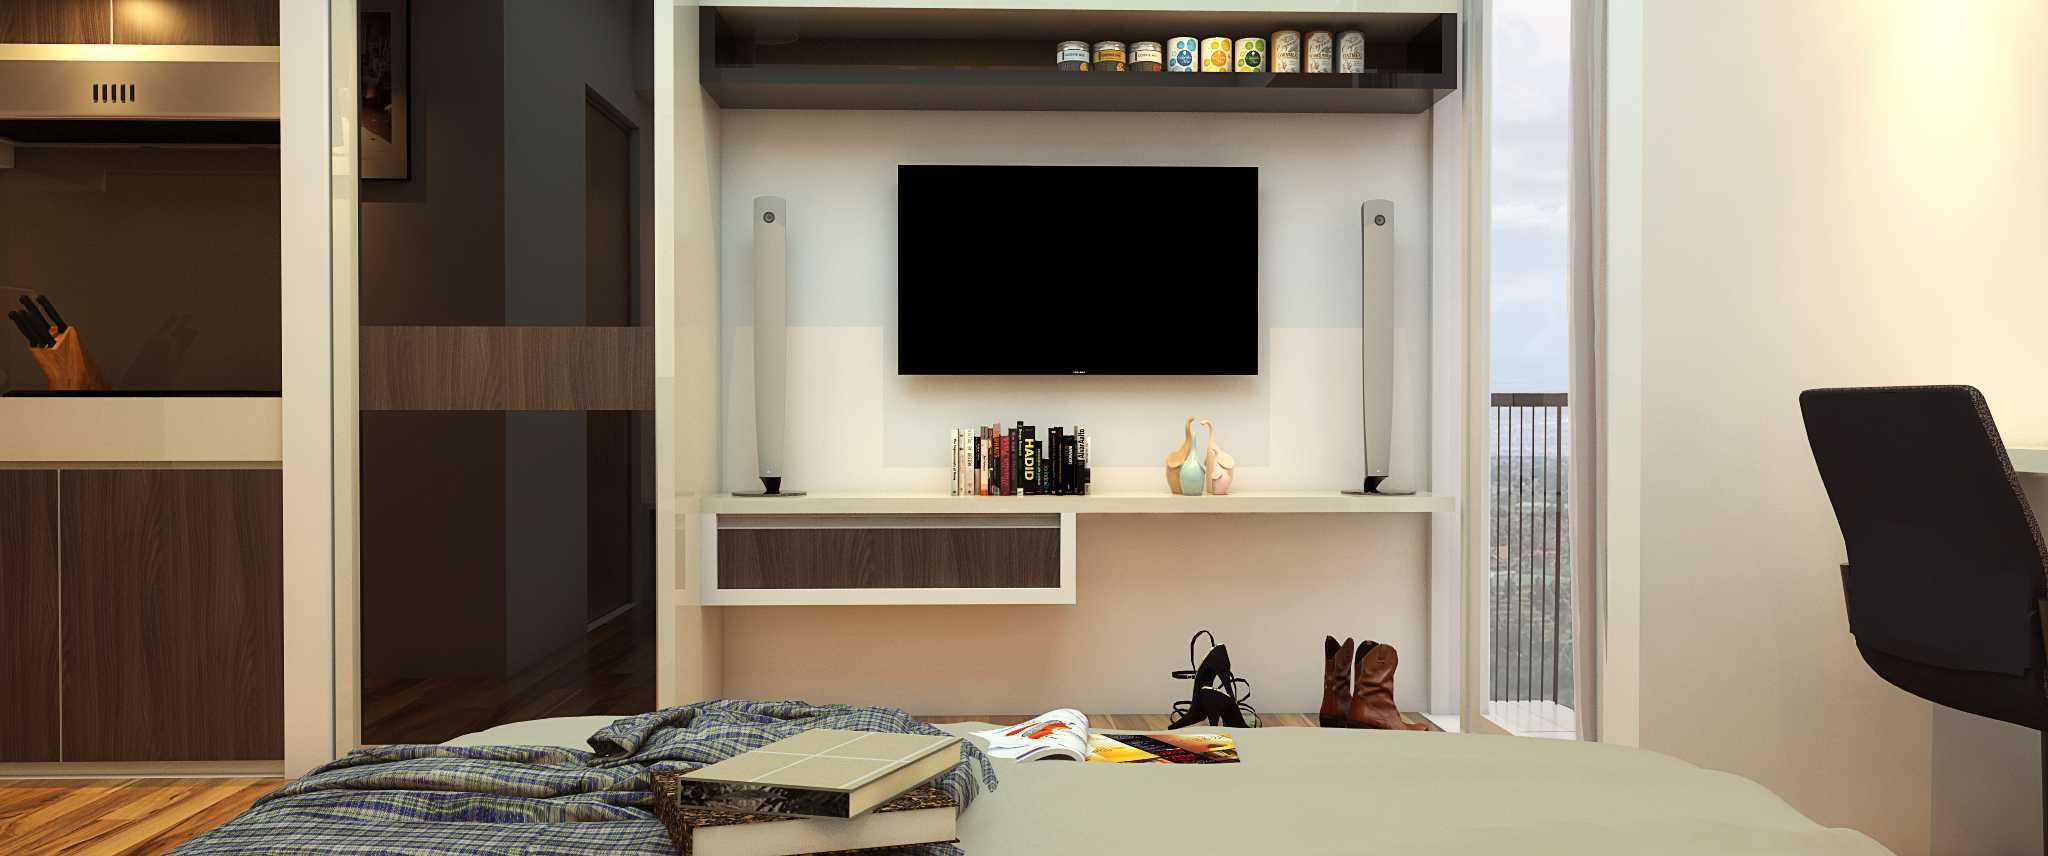 Sabio Design Studio Apartment Design At The Meikarta Cibatu, Cikarang Sel., Bekasi, Jawa Barat 17530, Indonesia Cibatu, Cikarang Sel., Bekasi, Jawa Barat 17530, Indonesia Sabio-Design-Studio-Apartment-Design-At-The-Meikarta Modern 119889